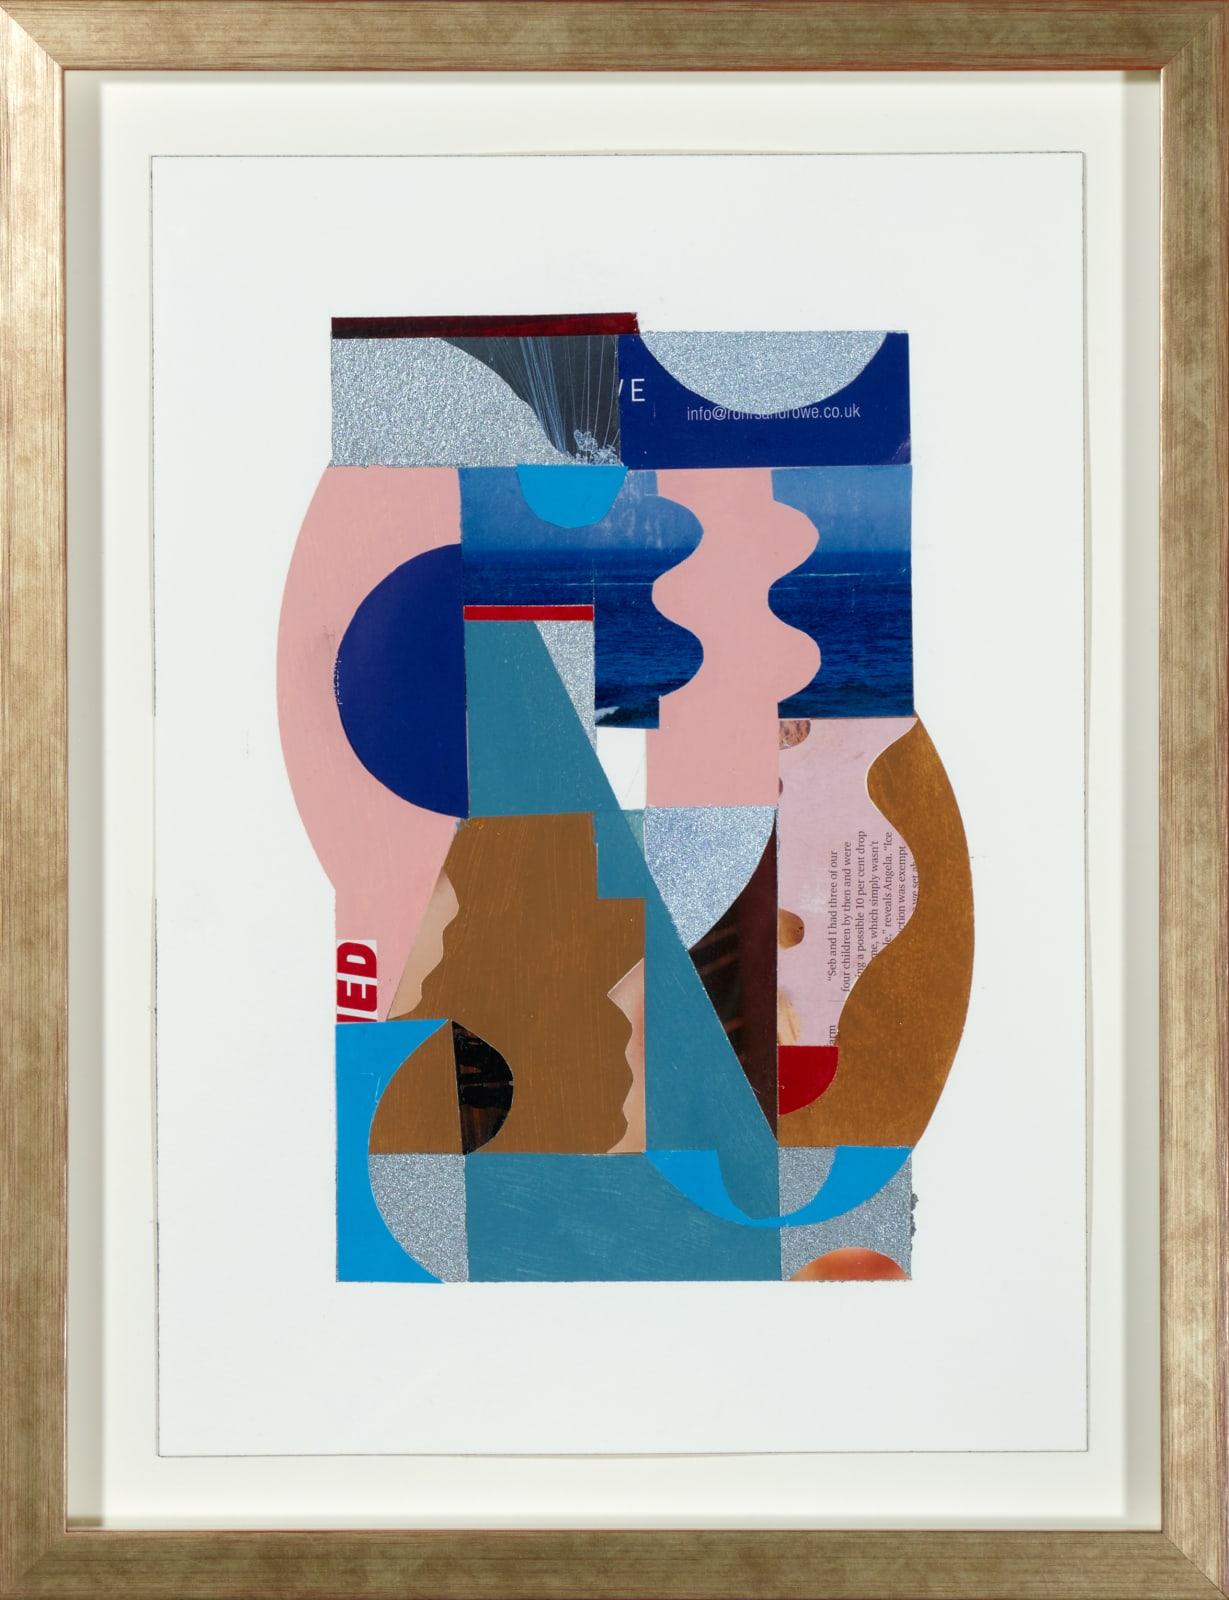 Jeremy Annear, Beach Candy (no.51), 2020